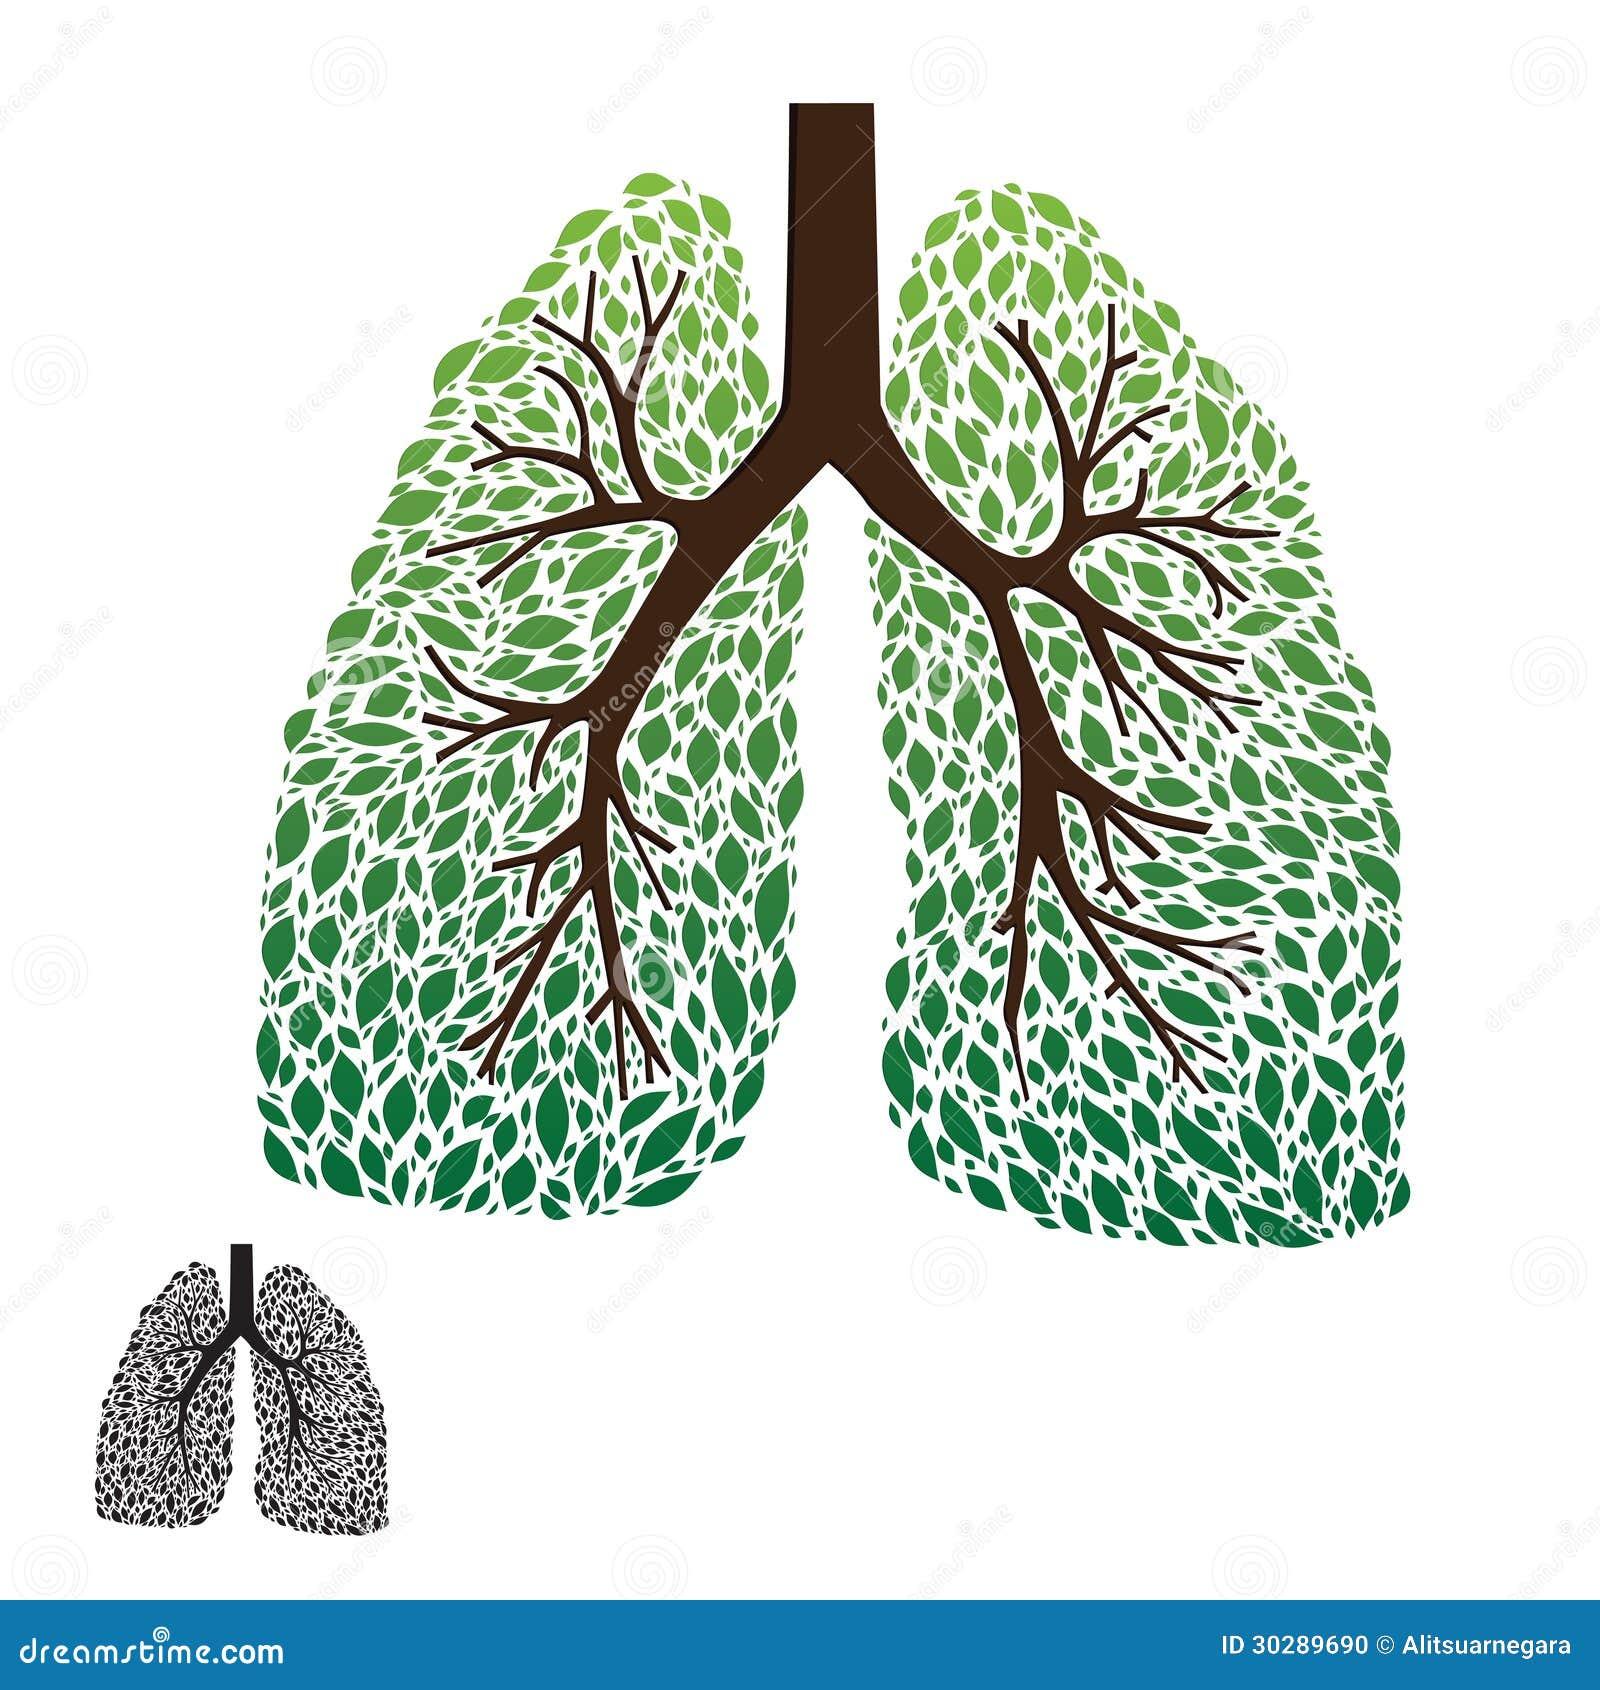 肺����y�9����_叶子肺